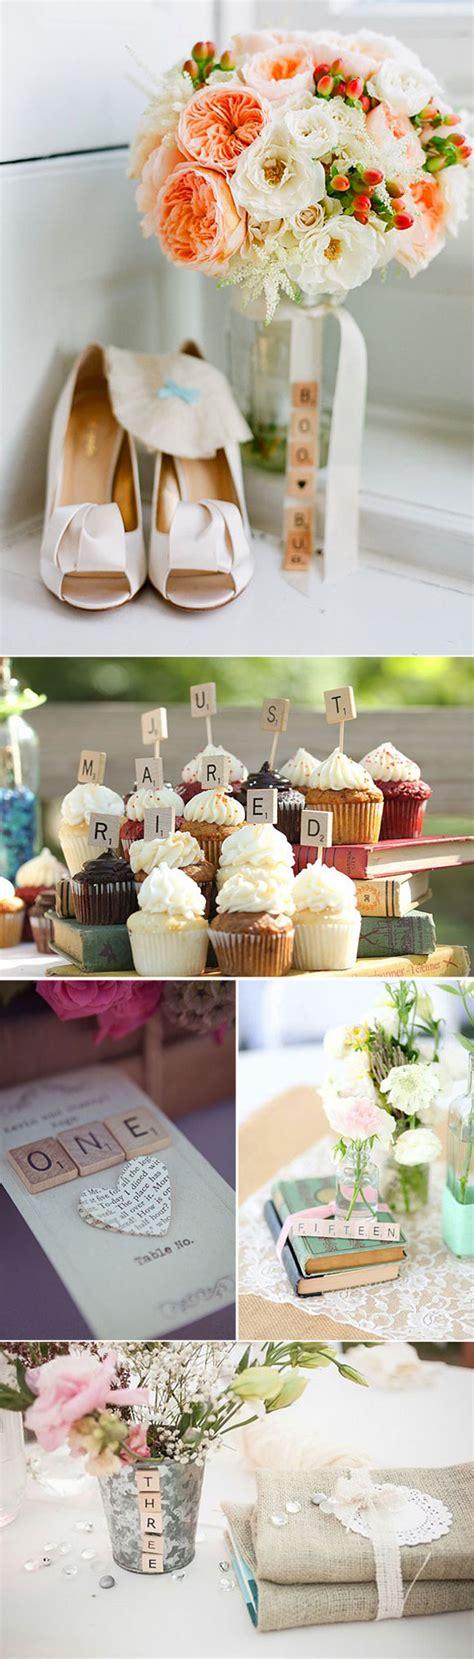 decoracion de letras de madera para boda letras de scrabble para decorar tu boda